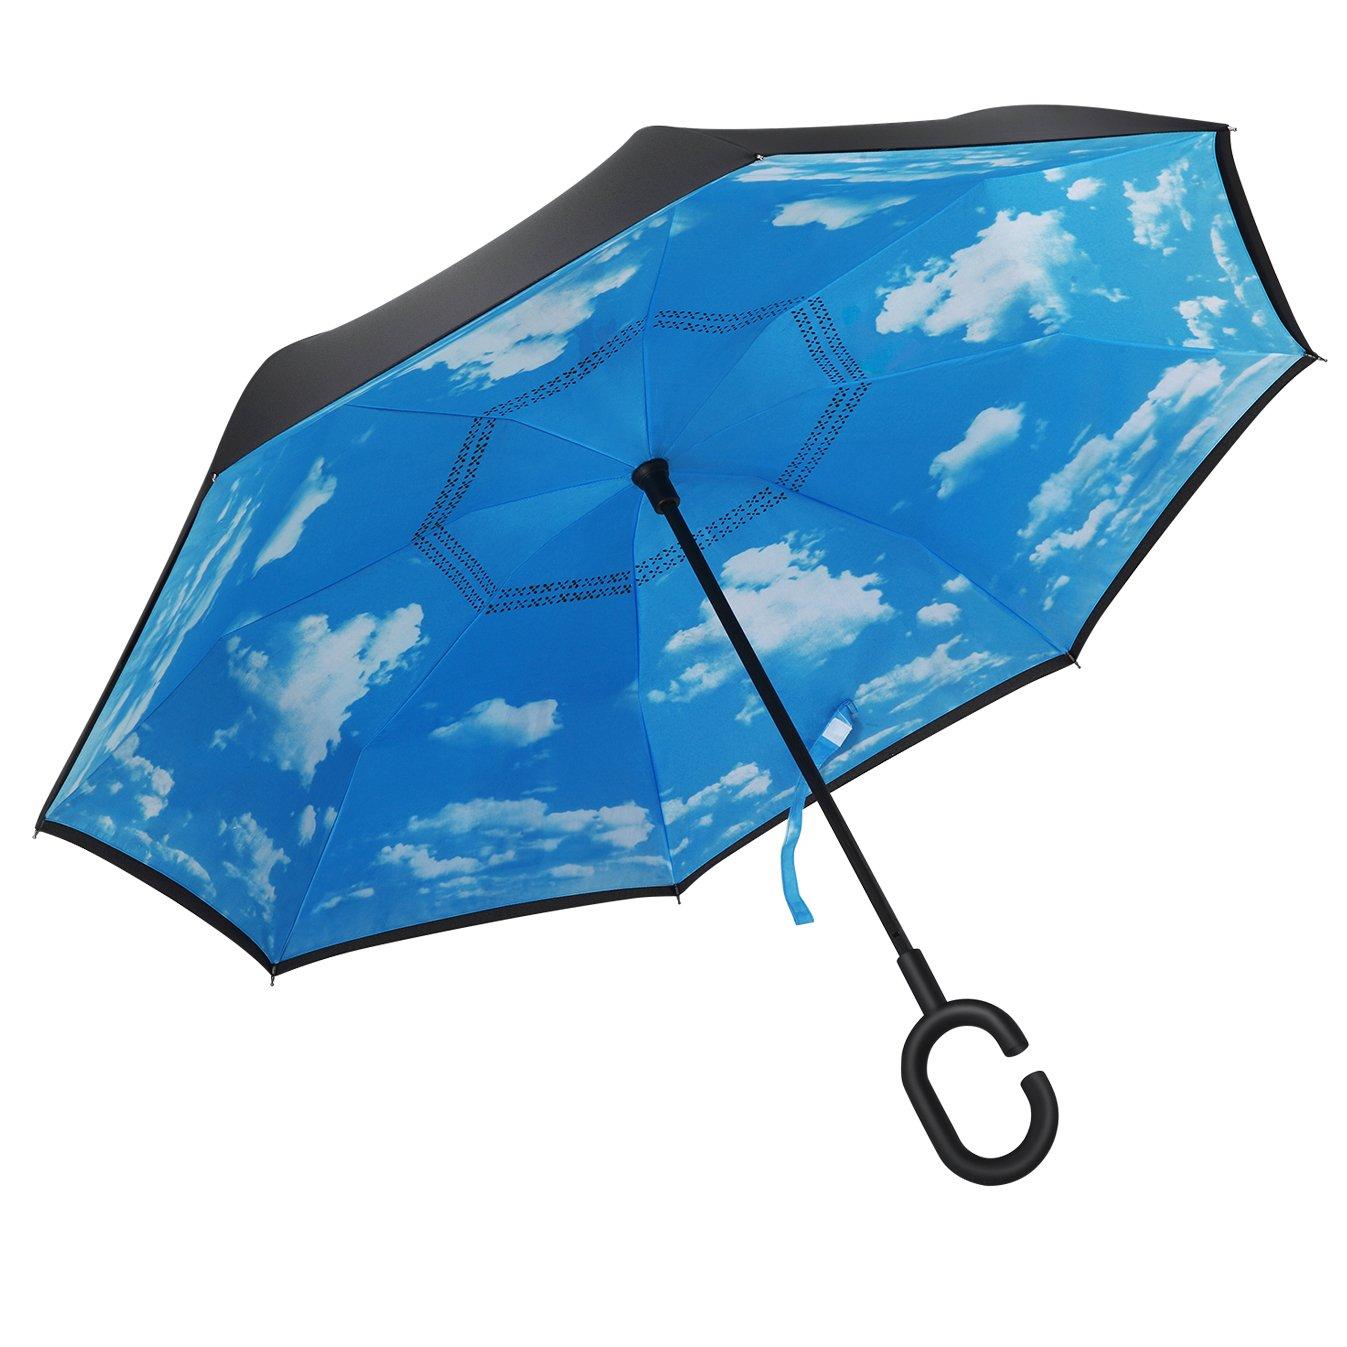 PLEMO(プレモ)C型持ち手逆さ傘 2,799円